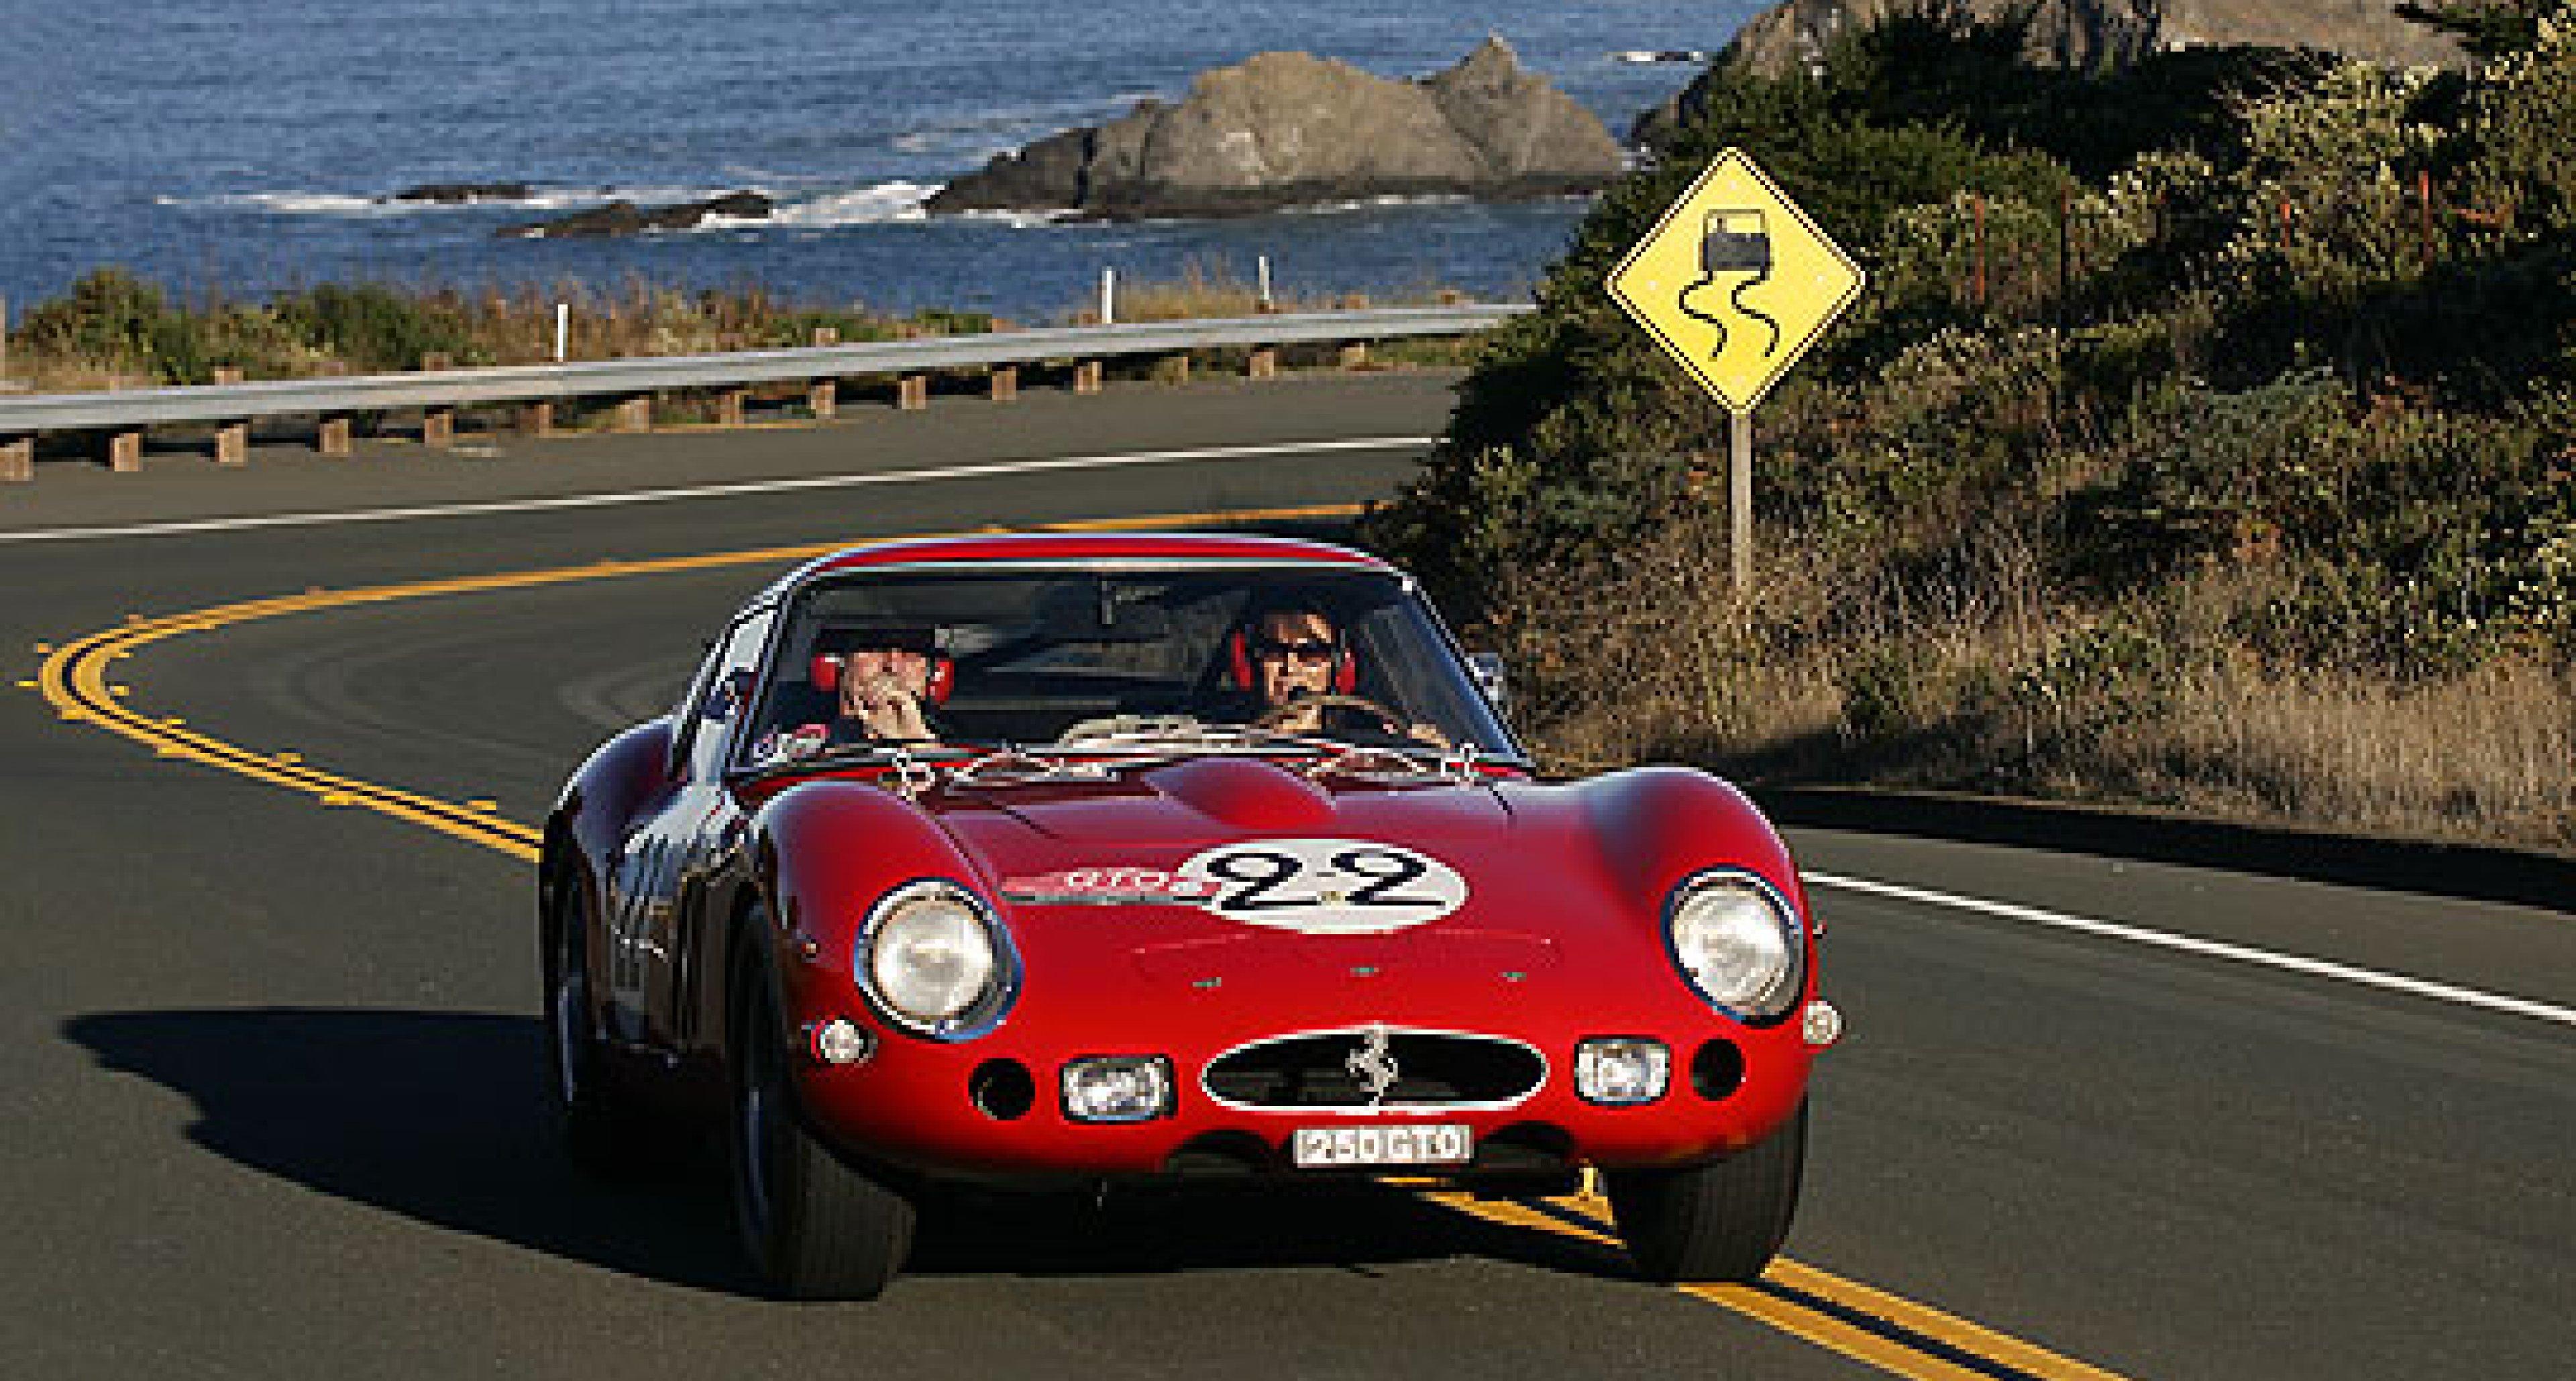 Moët & Chandon Fabulous Ferrari 250 GTO Tour 2007